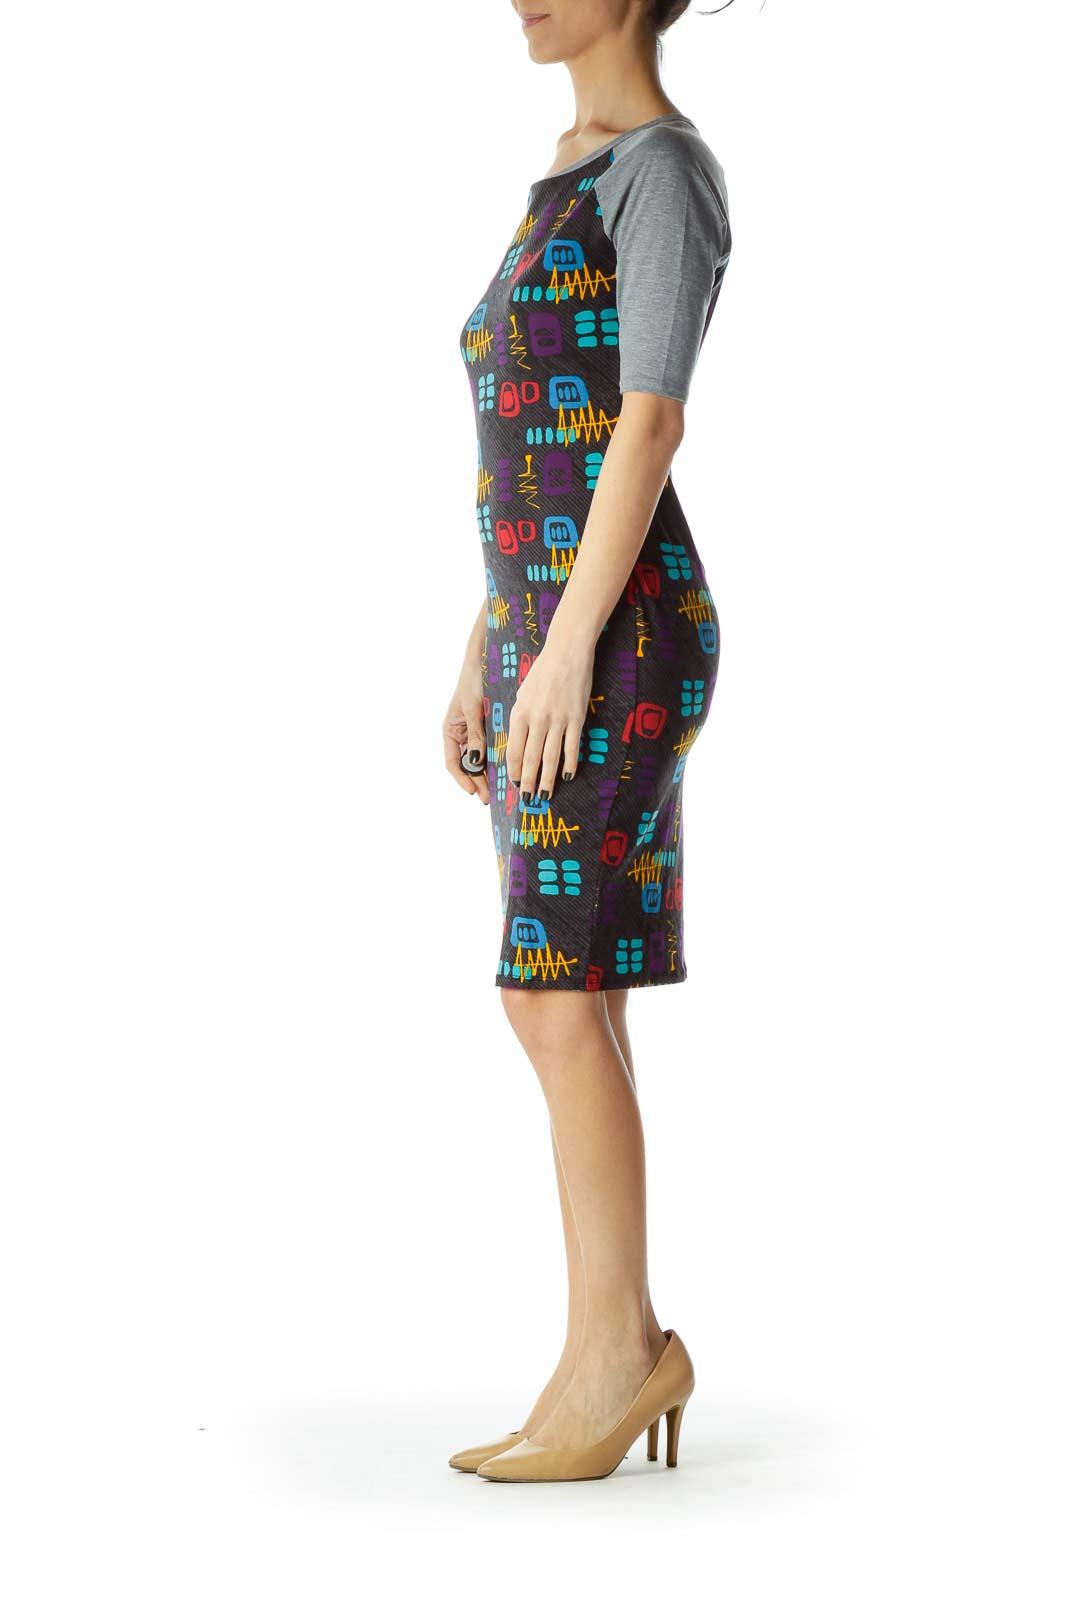 494d81f3694 Shop Black Print Bodycon Dress clothing and handbags at SilkRoll ...